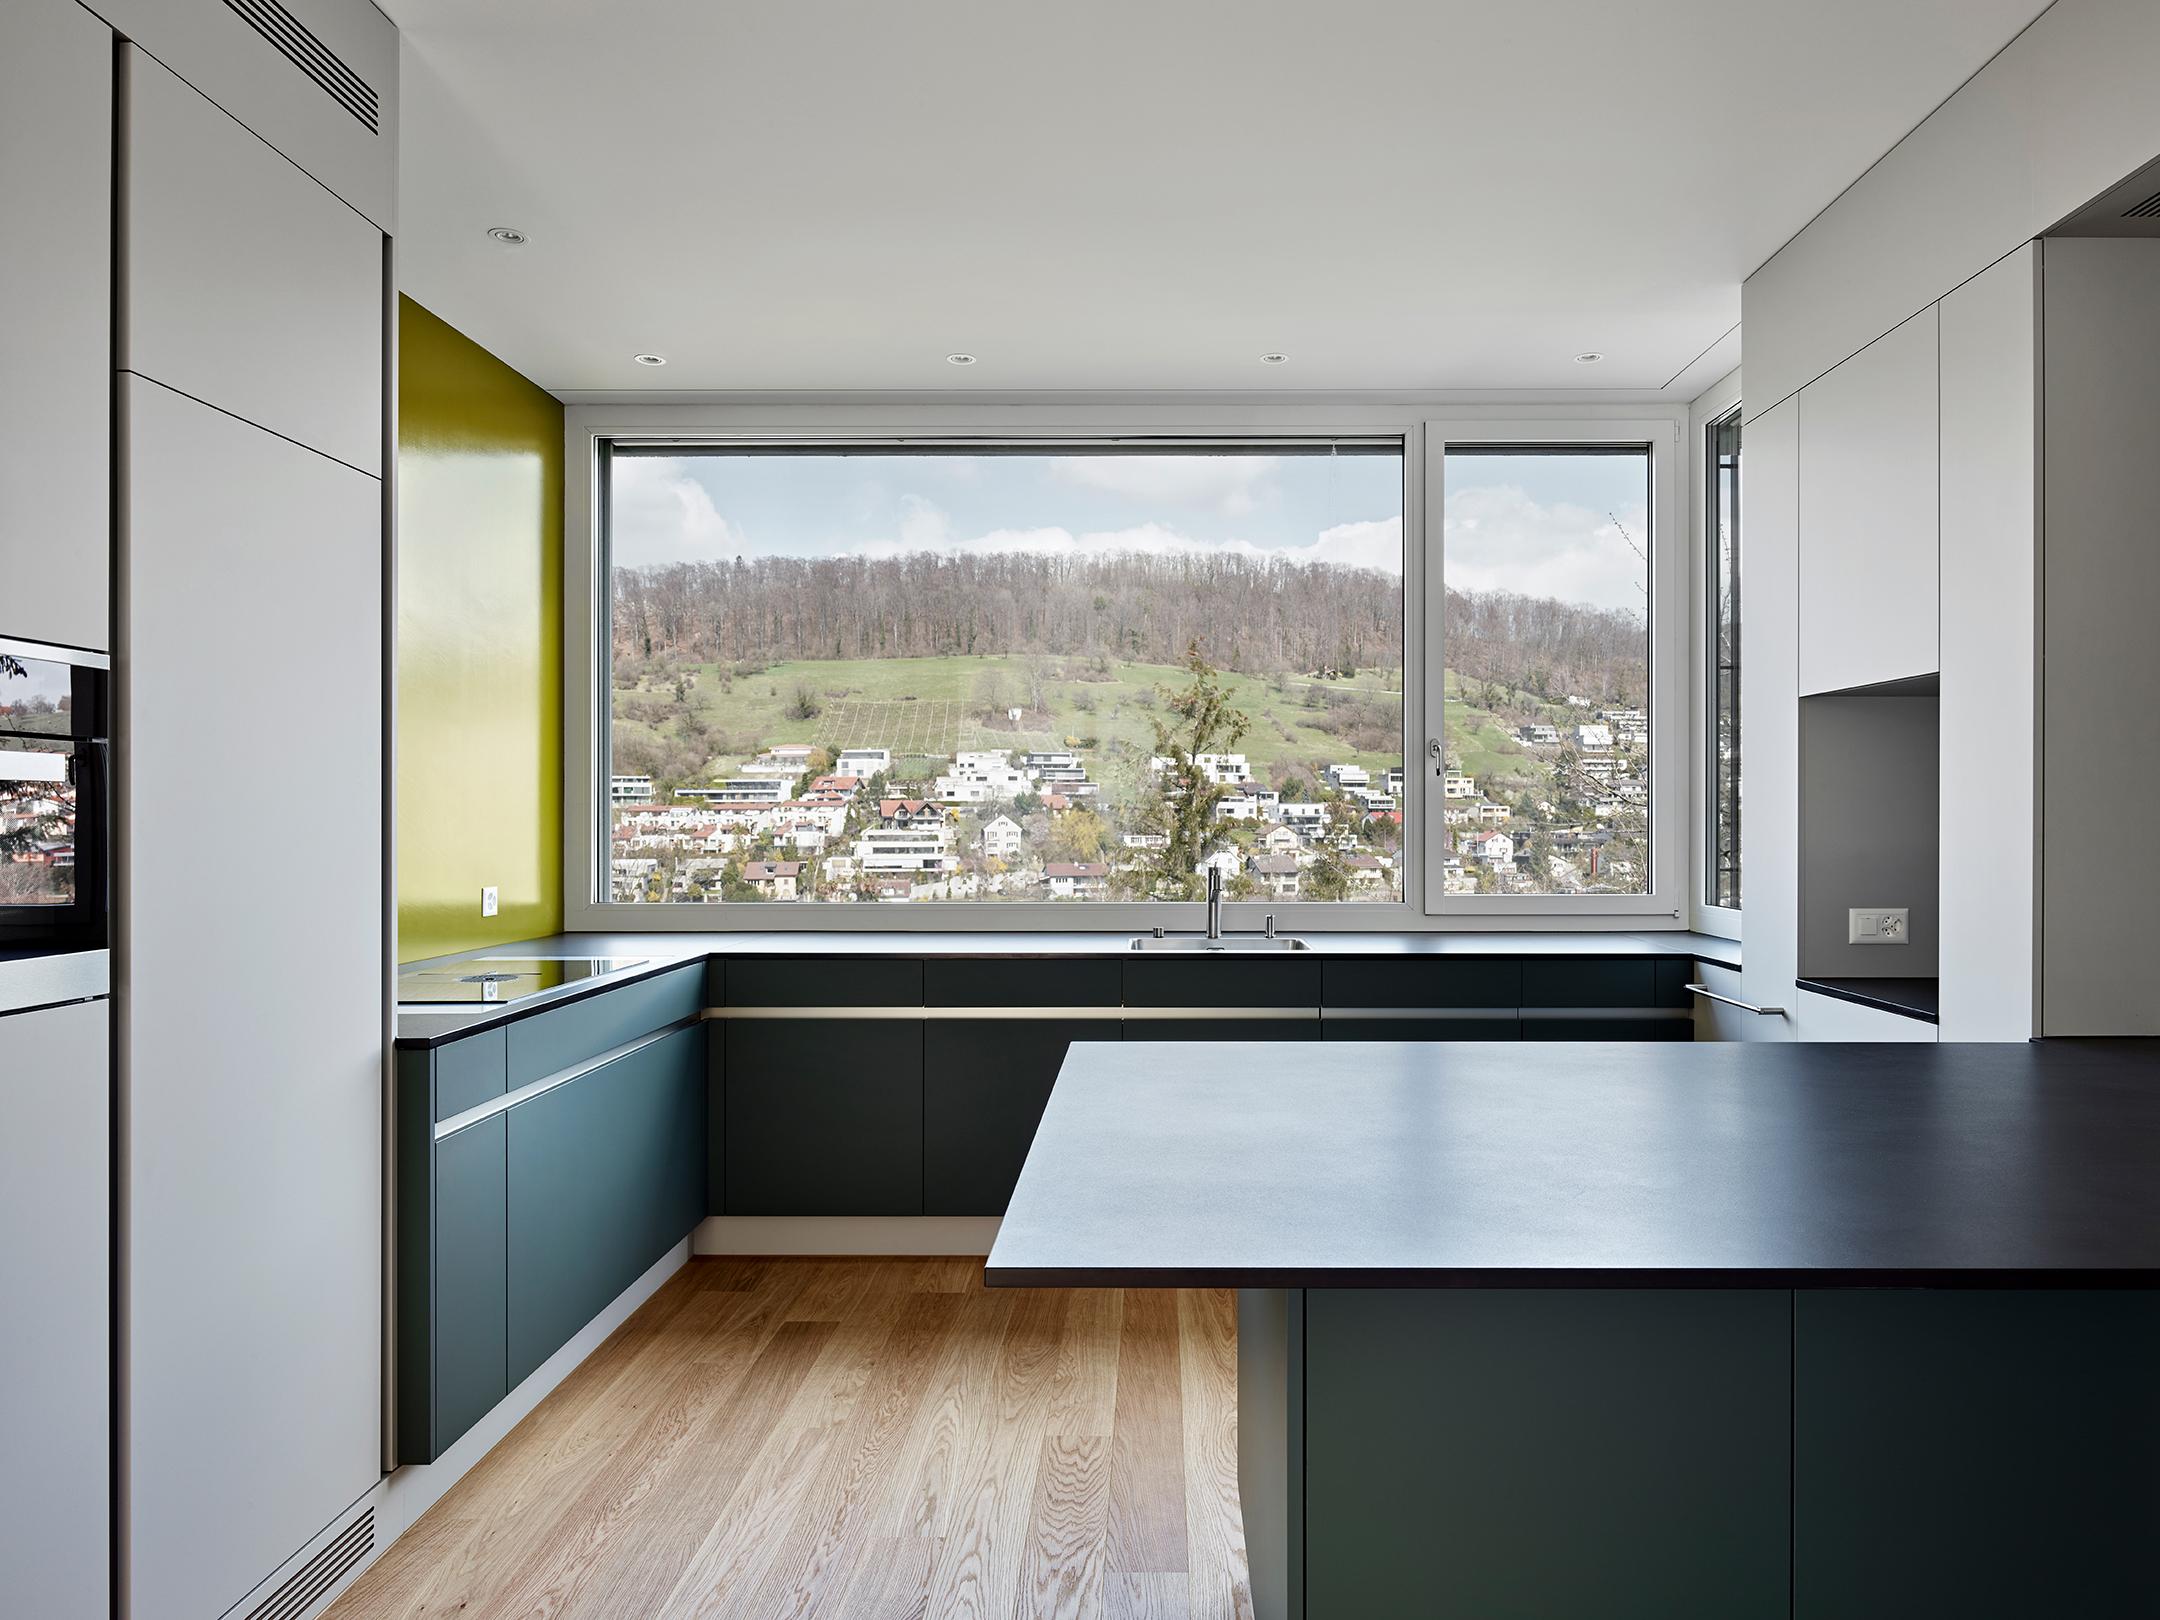 Pfister Klingenfuss Architekten, Haus W, Ennetbaden, Innenaufnahme 6